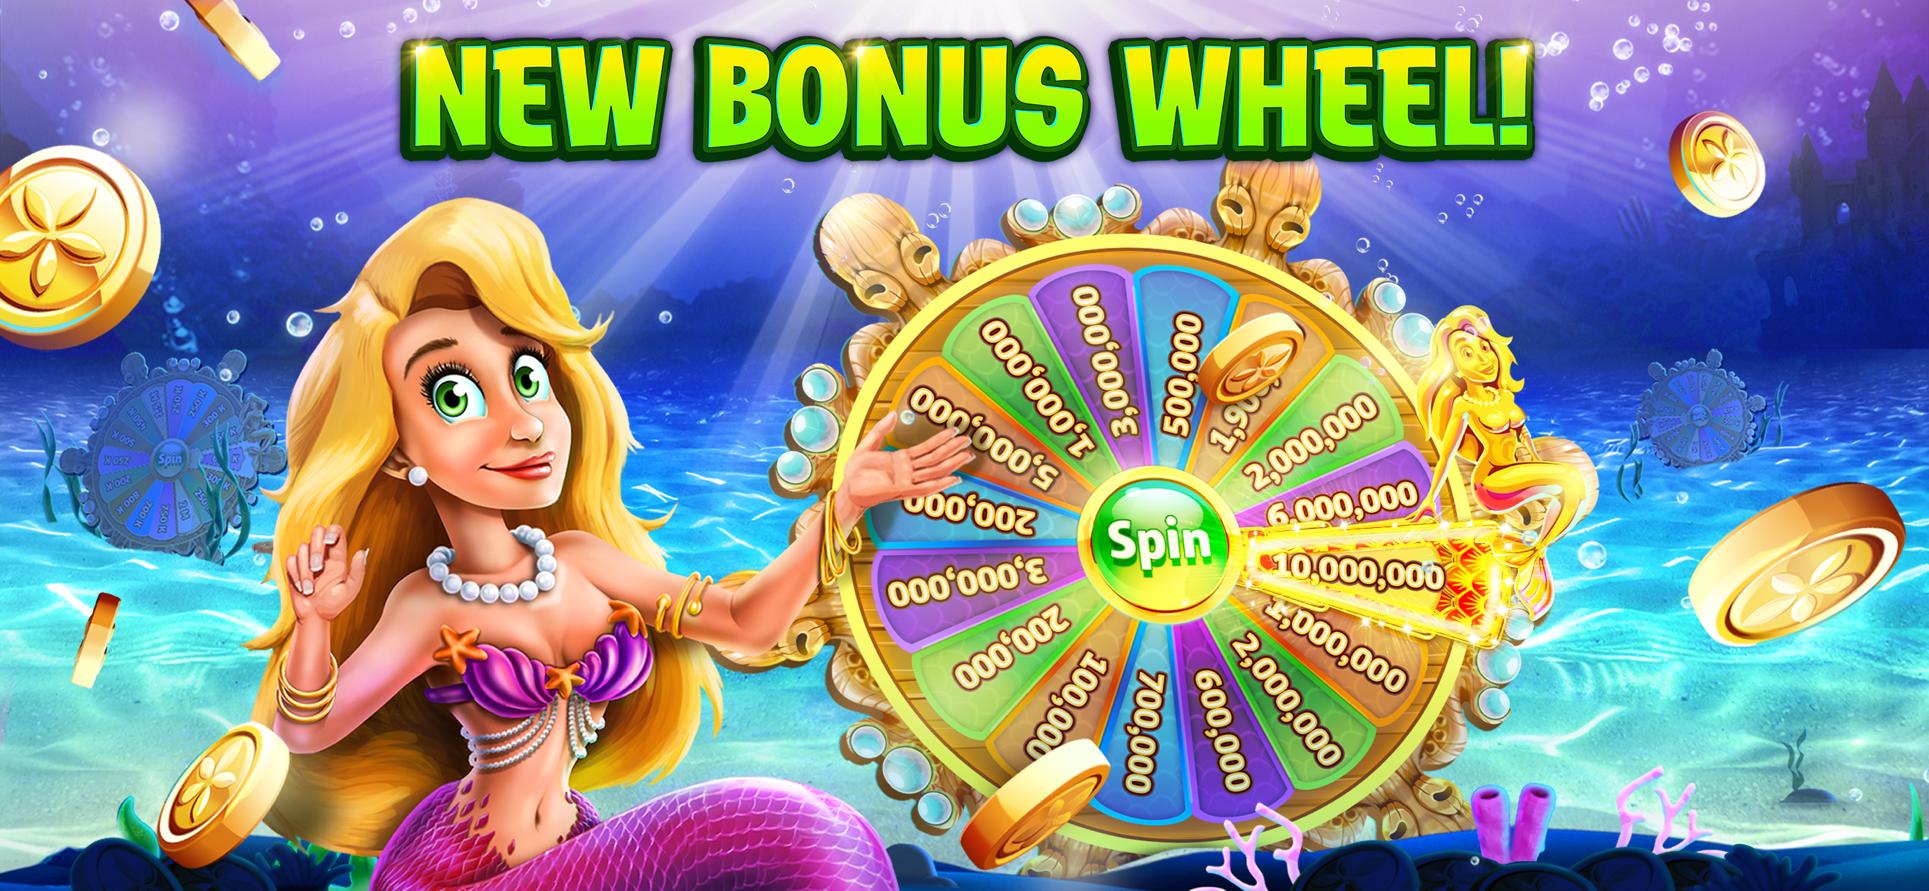 Crypto thrills casino no deposit bonus